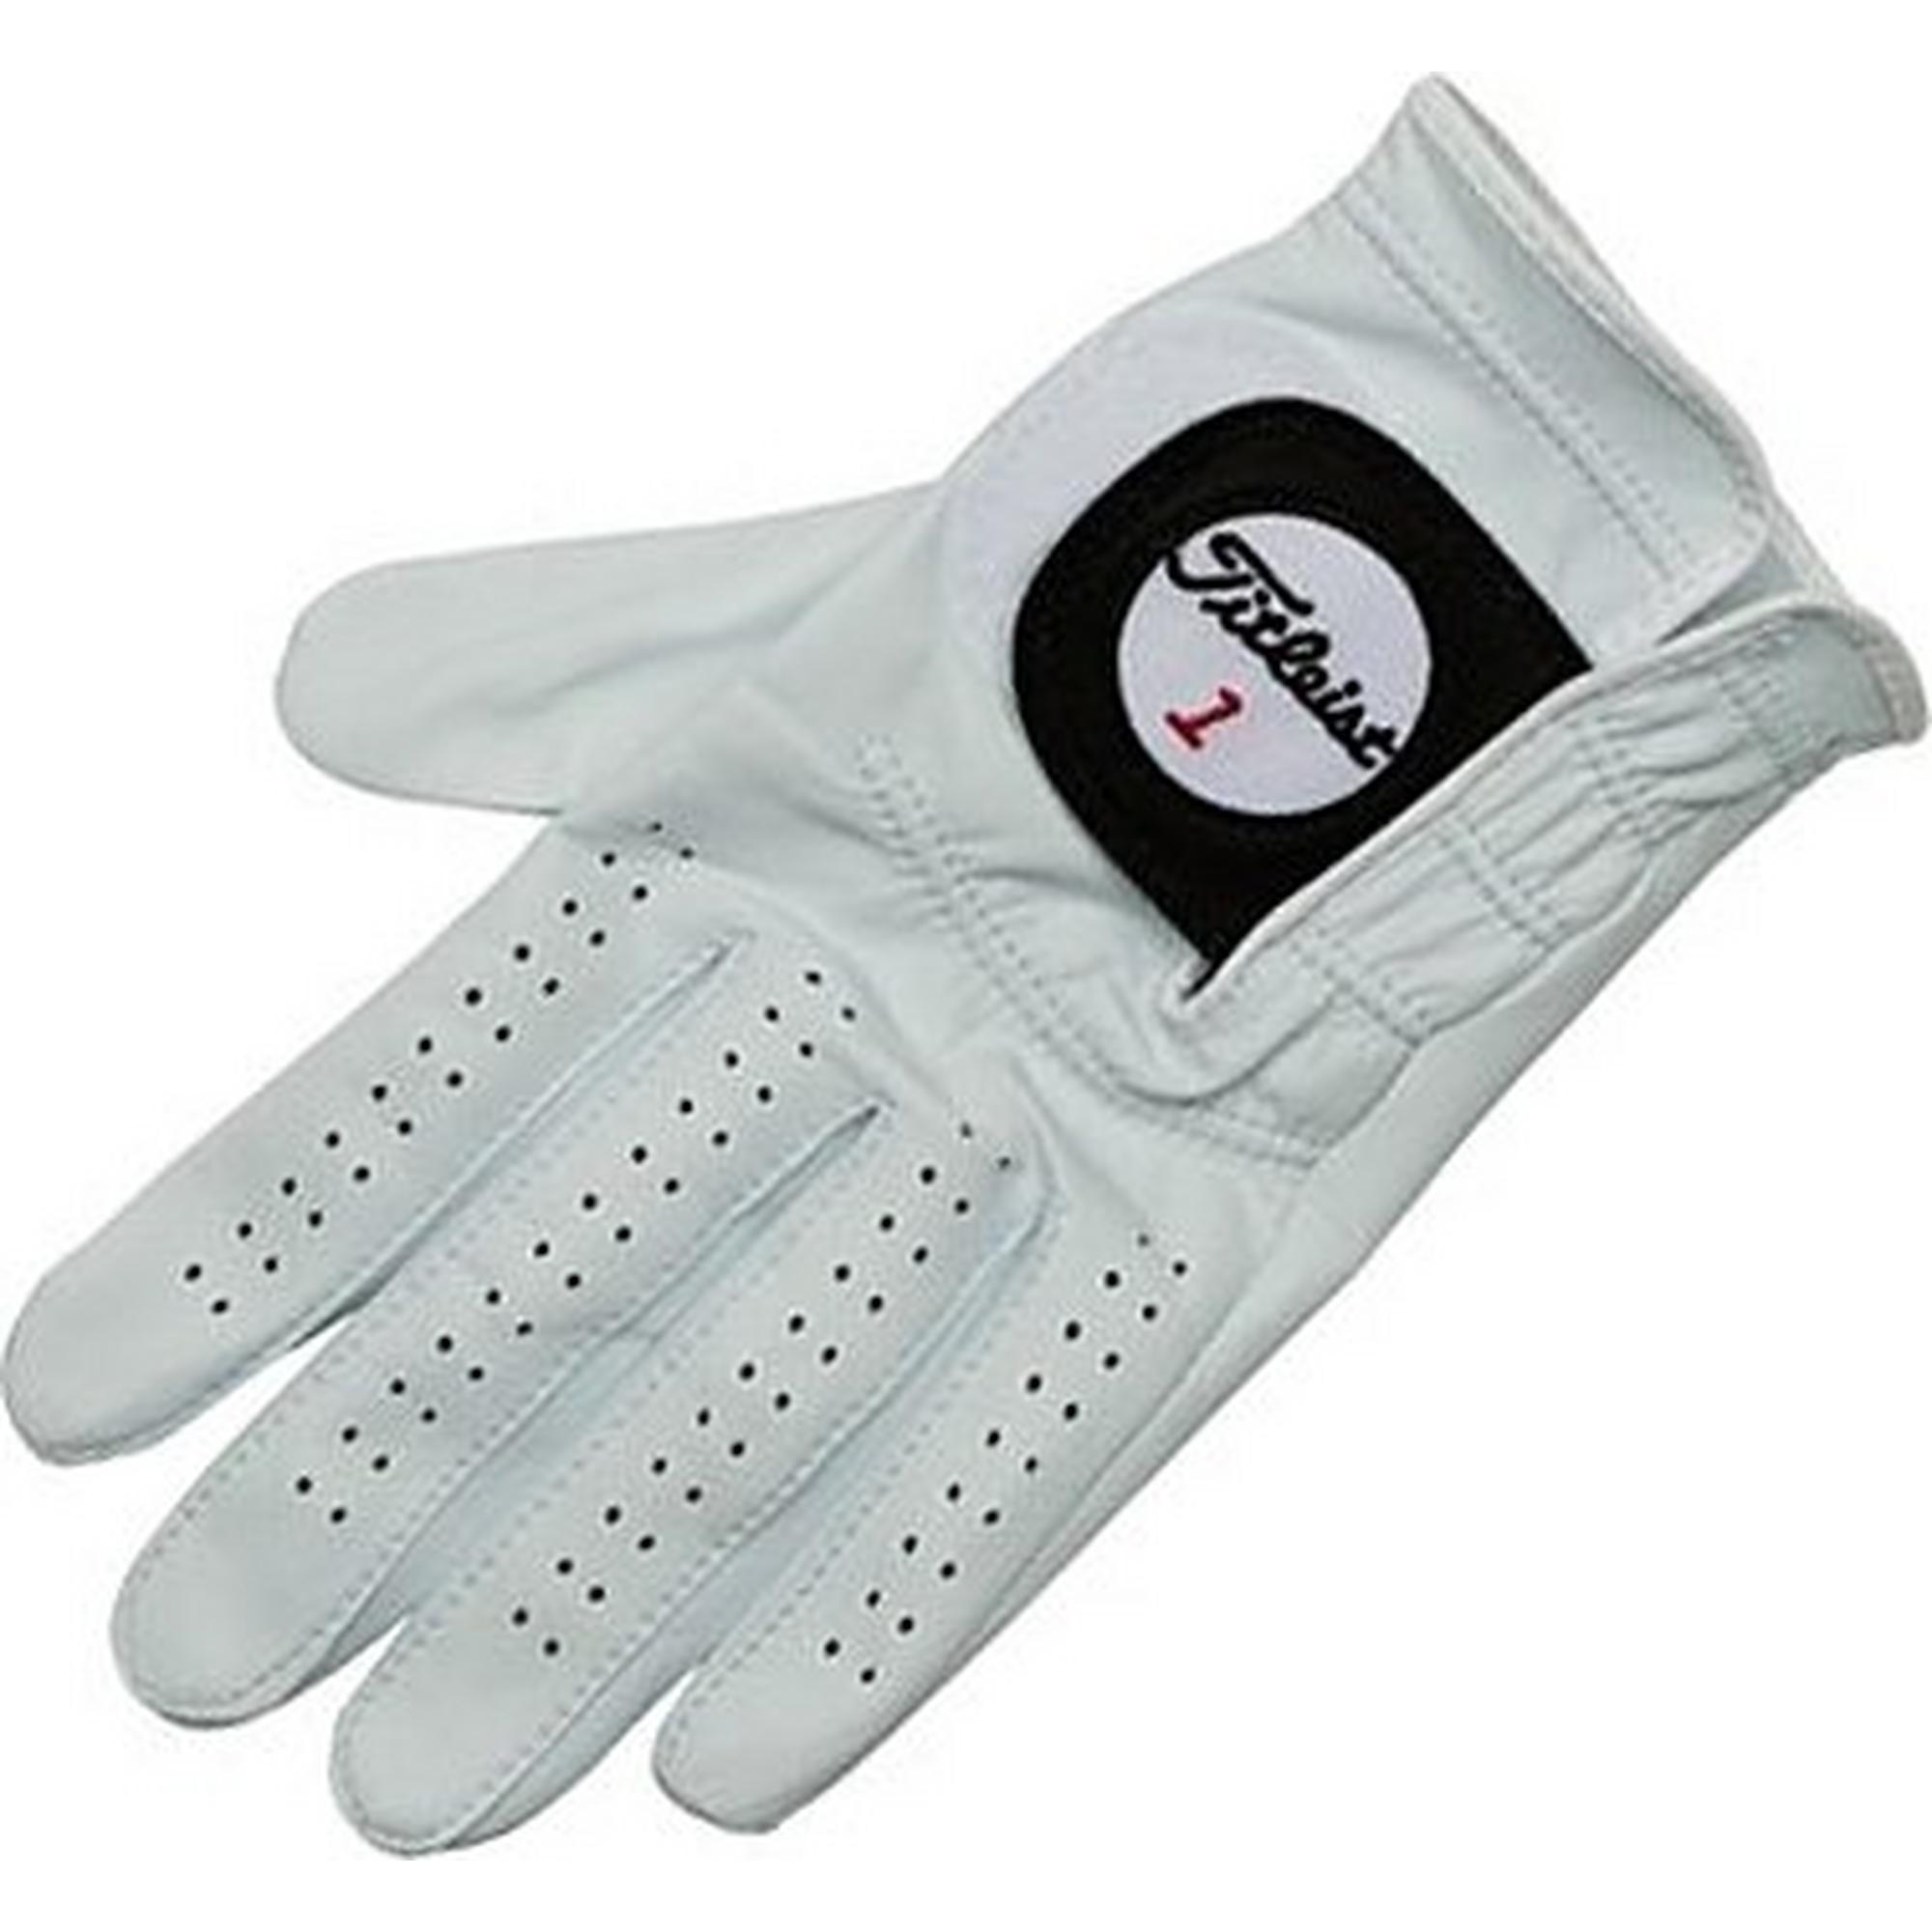 Players Golf Glove